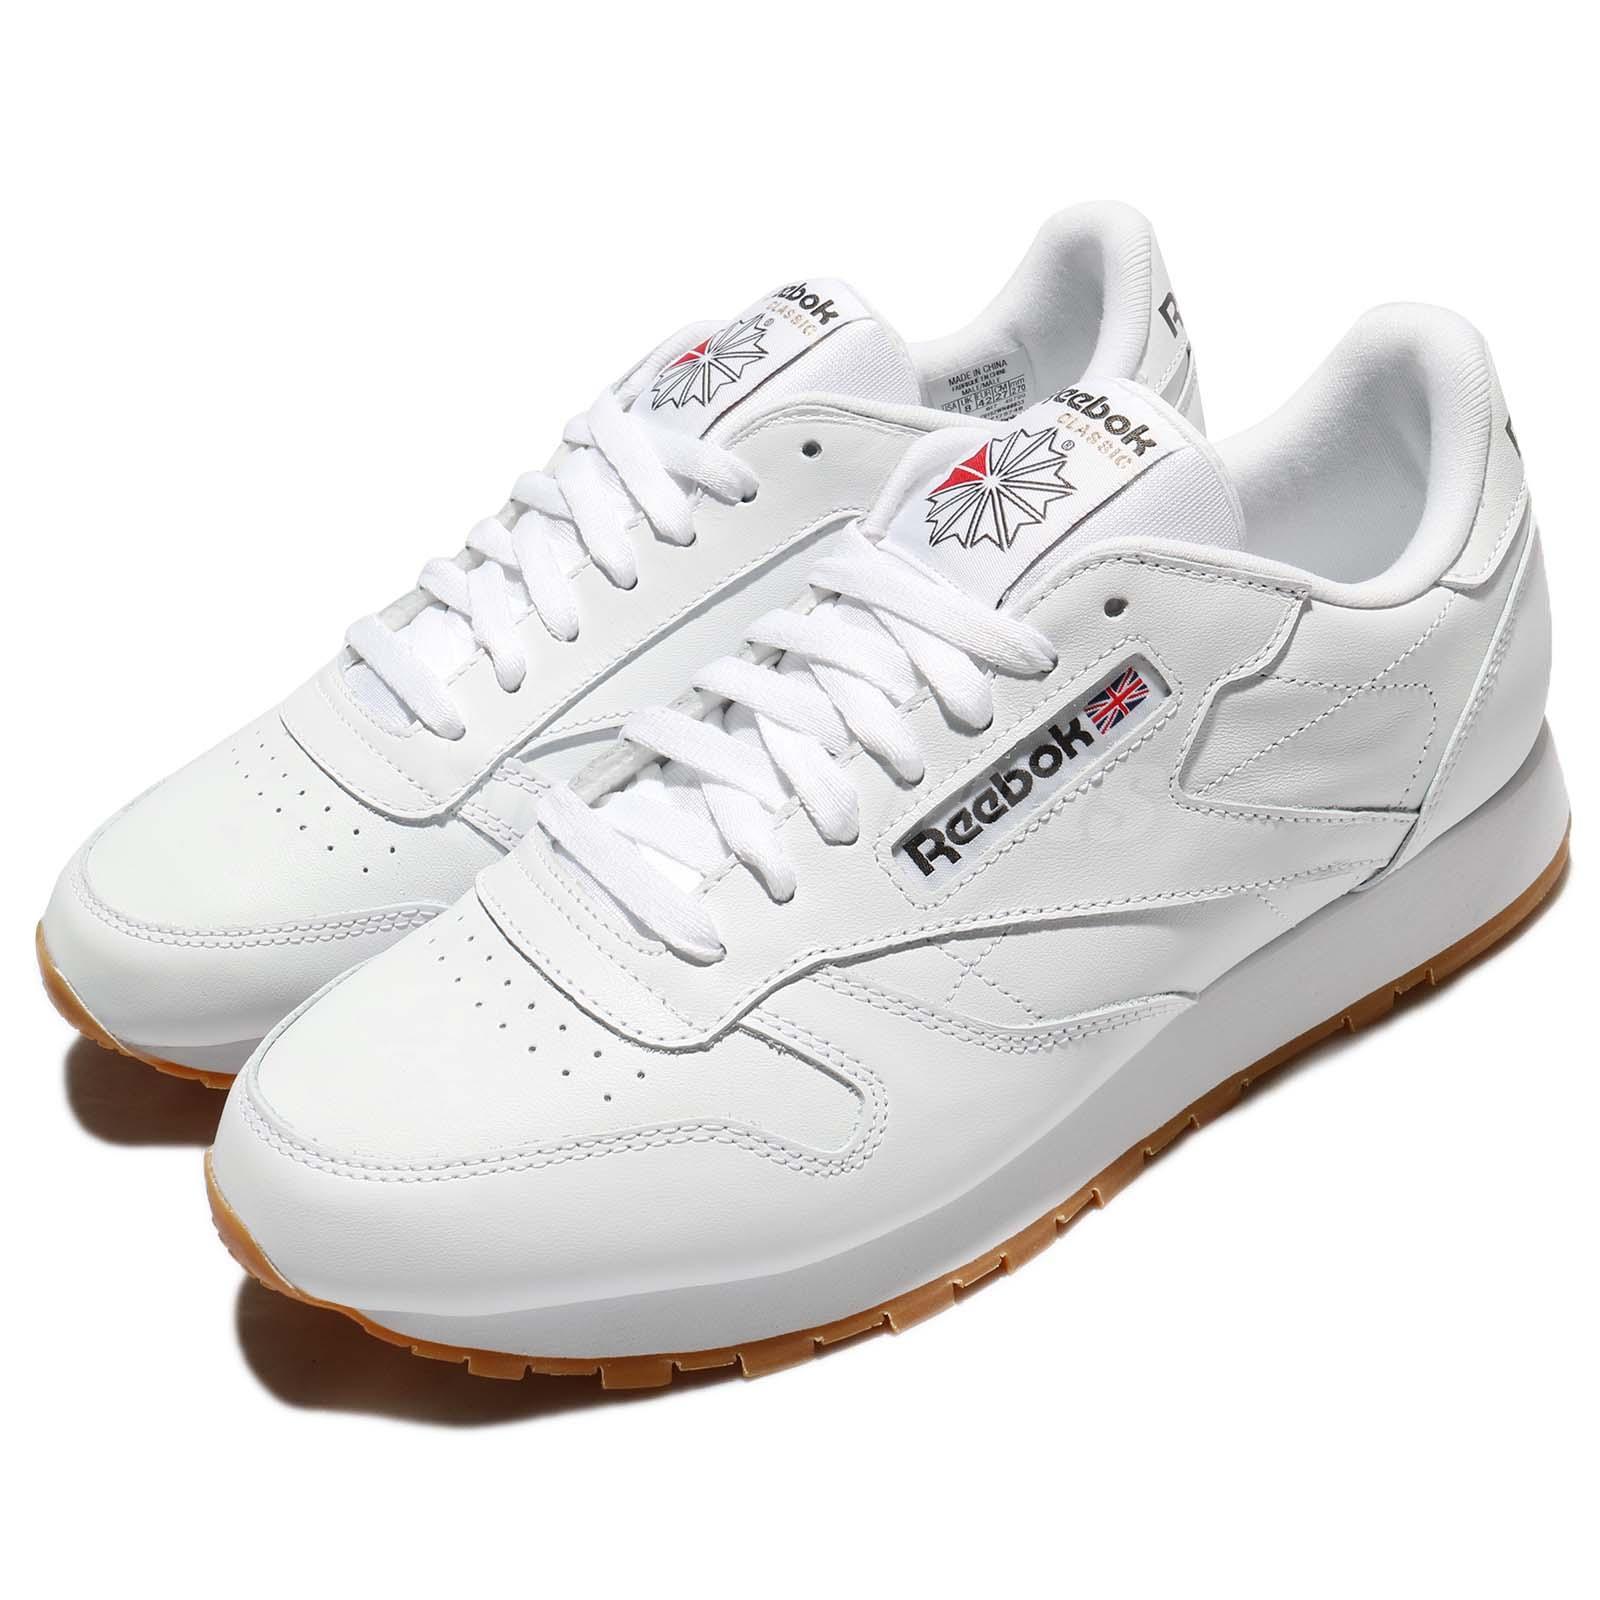 ddec3661 Details about Reebok CL LTHR Leather White Gum Retro Men Running Shoes  Sneakers 49799